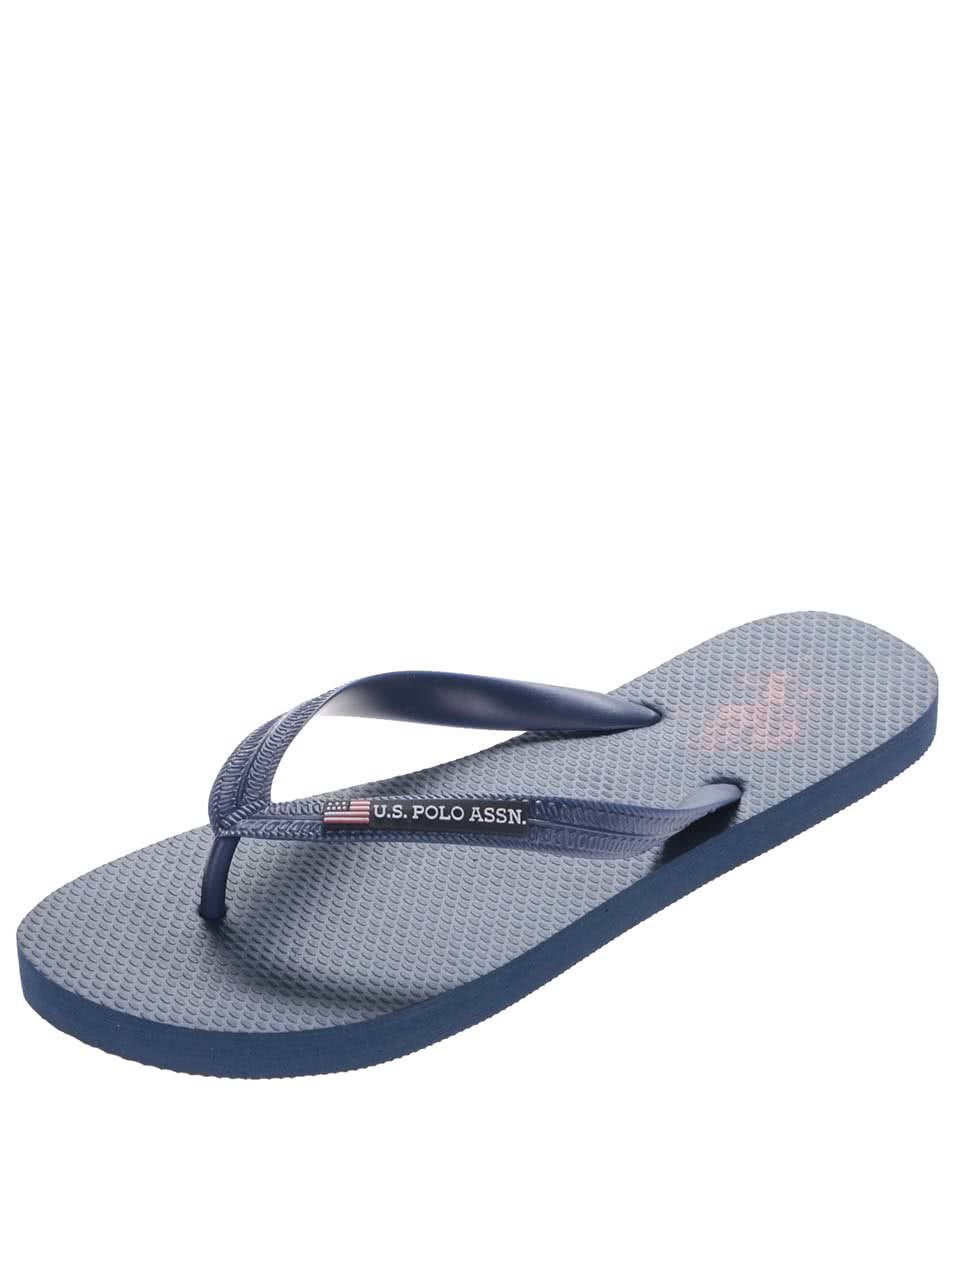 0f26810522 Tmavě modré pánské žabky U.S. Polo Assn. Barclay ...